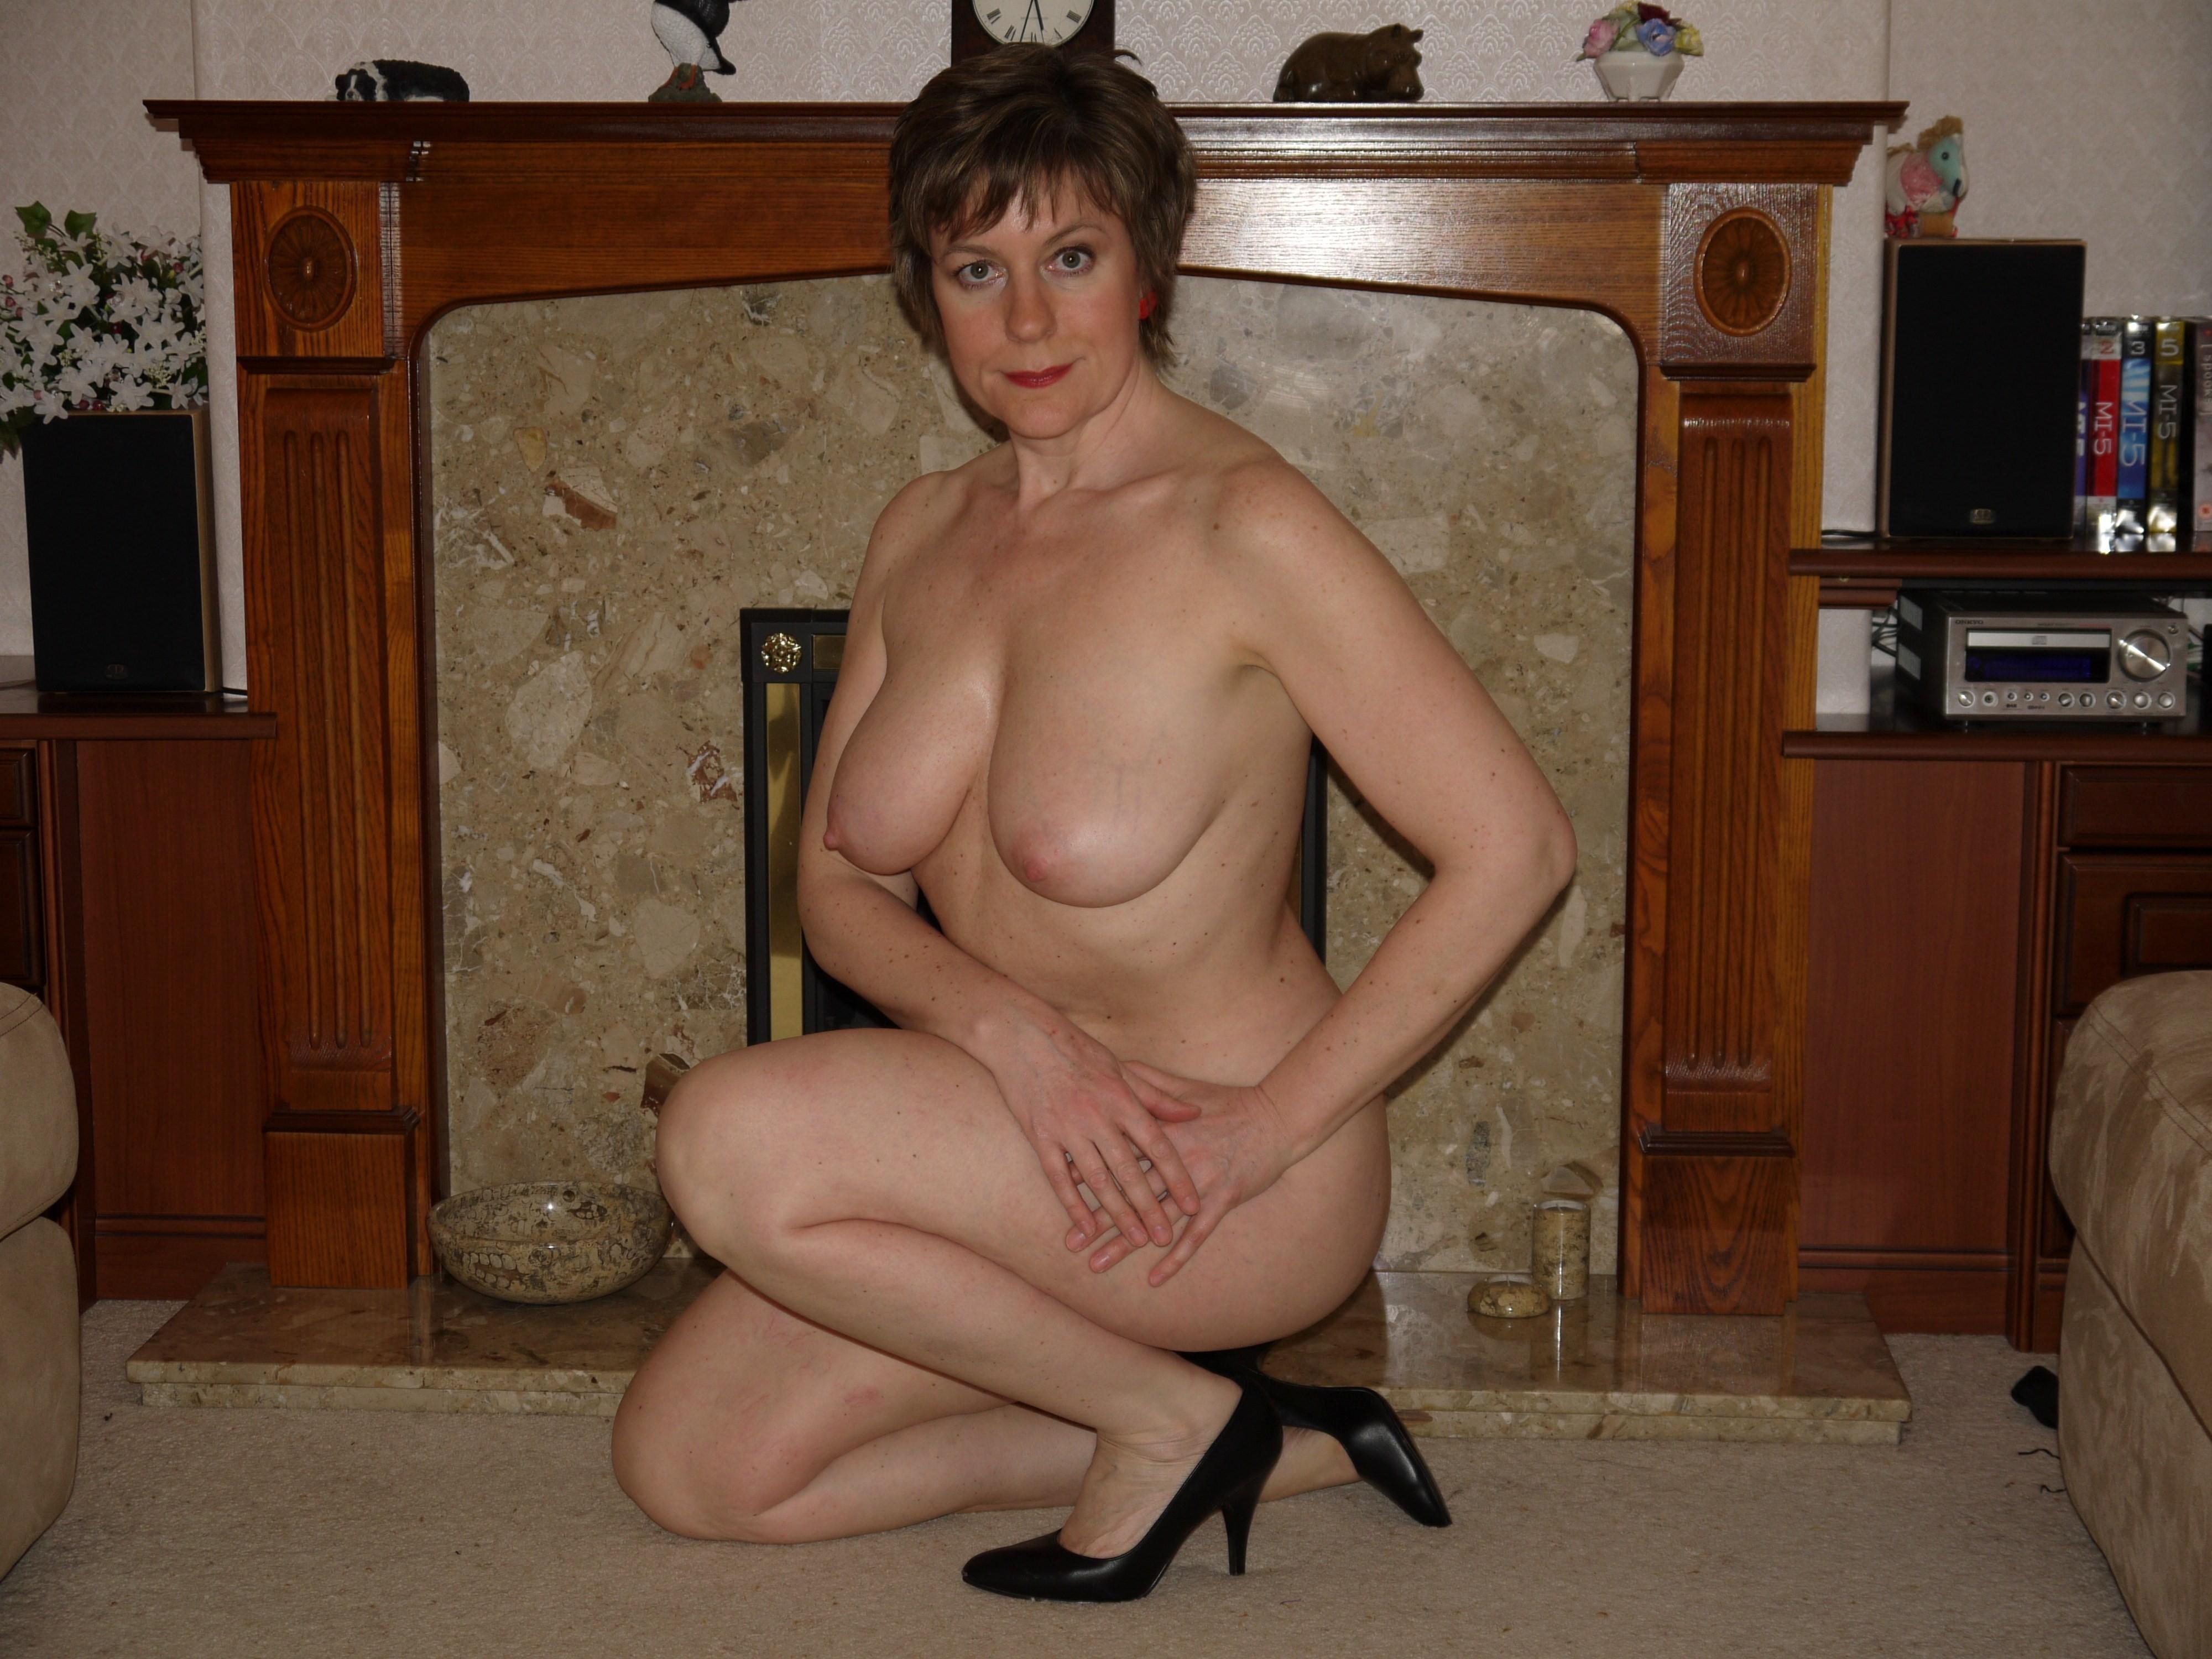 Эротические мама фото, Милфы фото секса с мамочками и зрелками 7 фотография